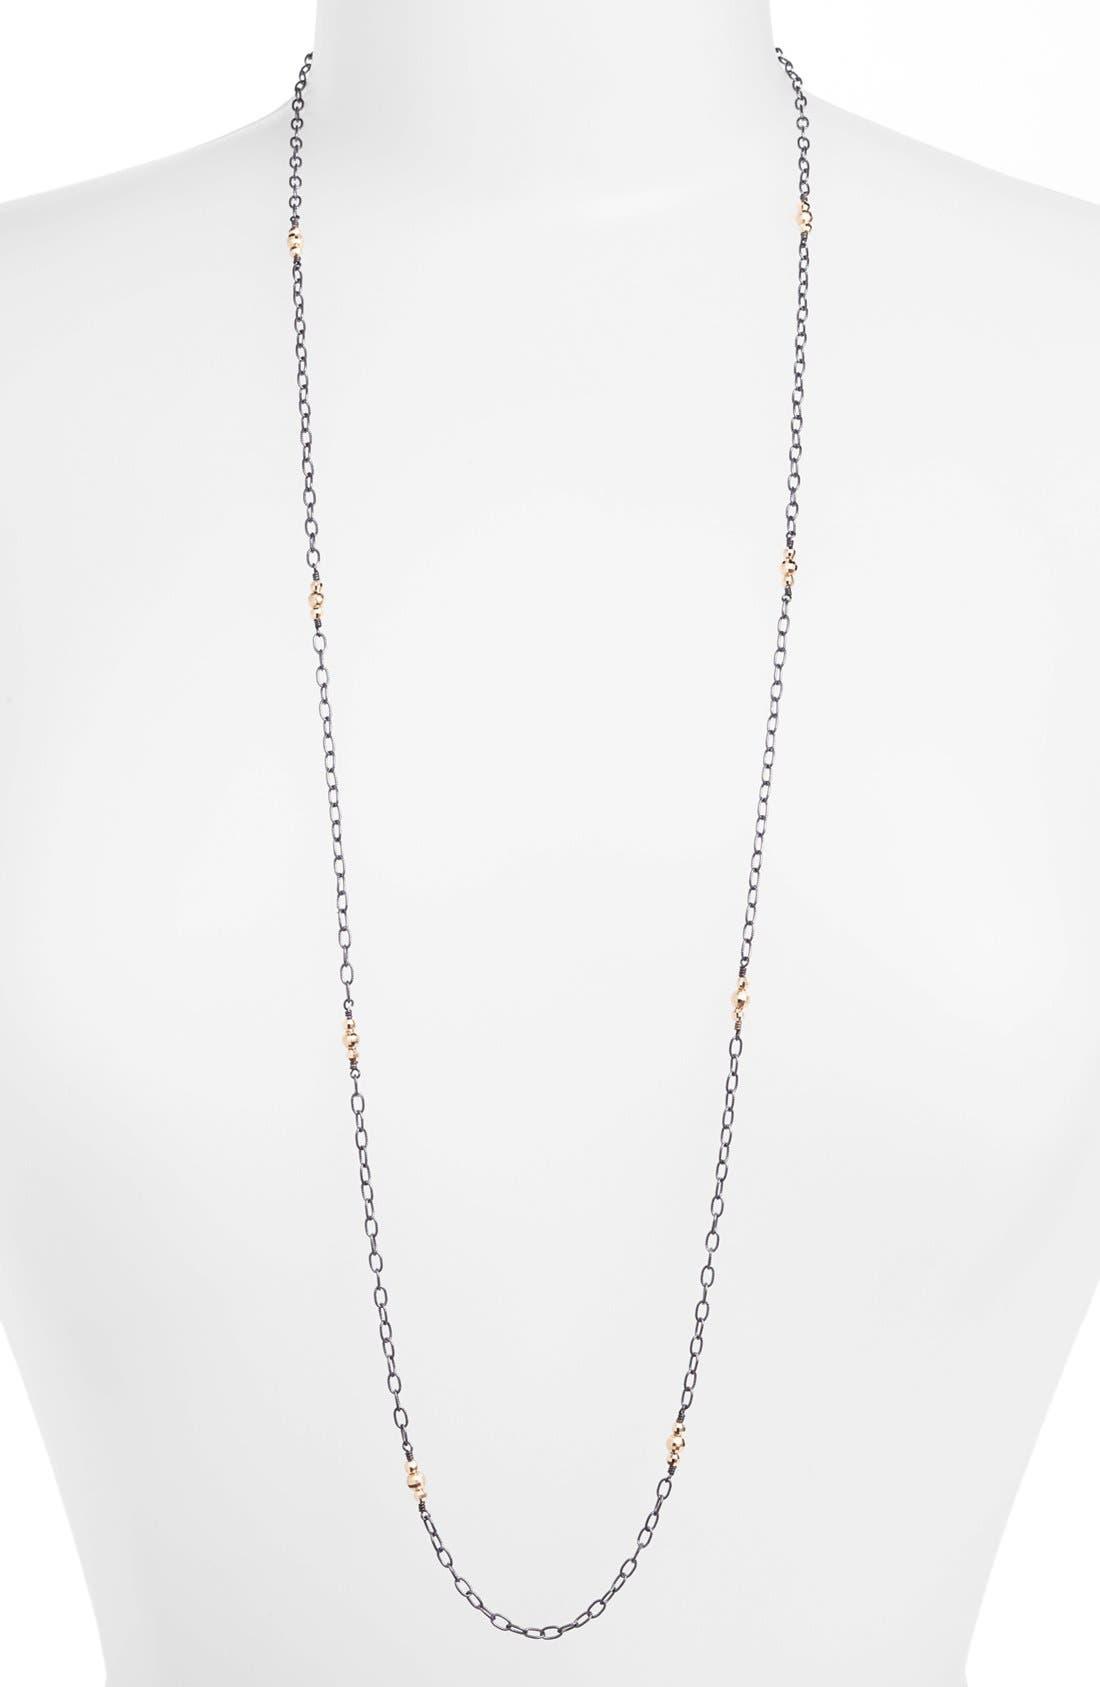 Main Image - Mizuki 'Cut Beads' Long Station Necklace